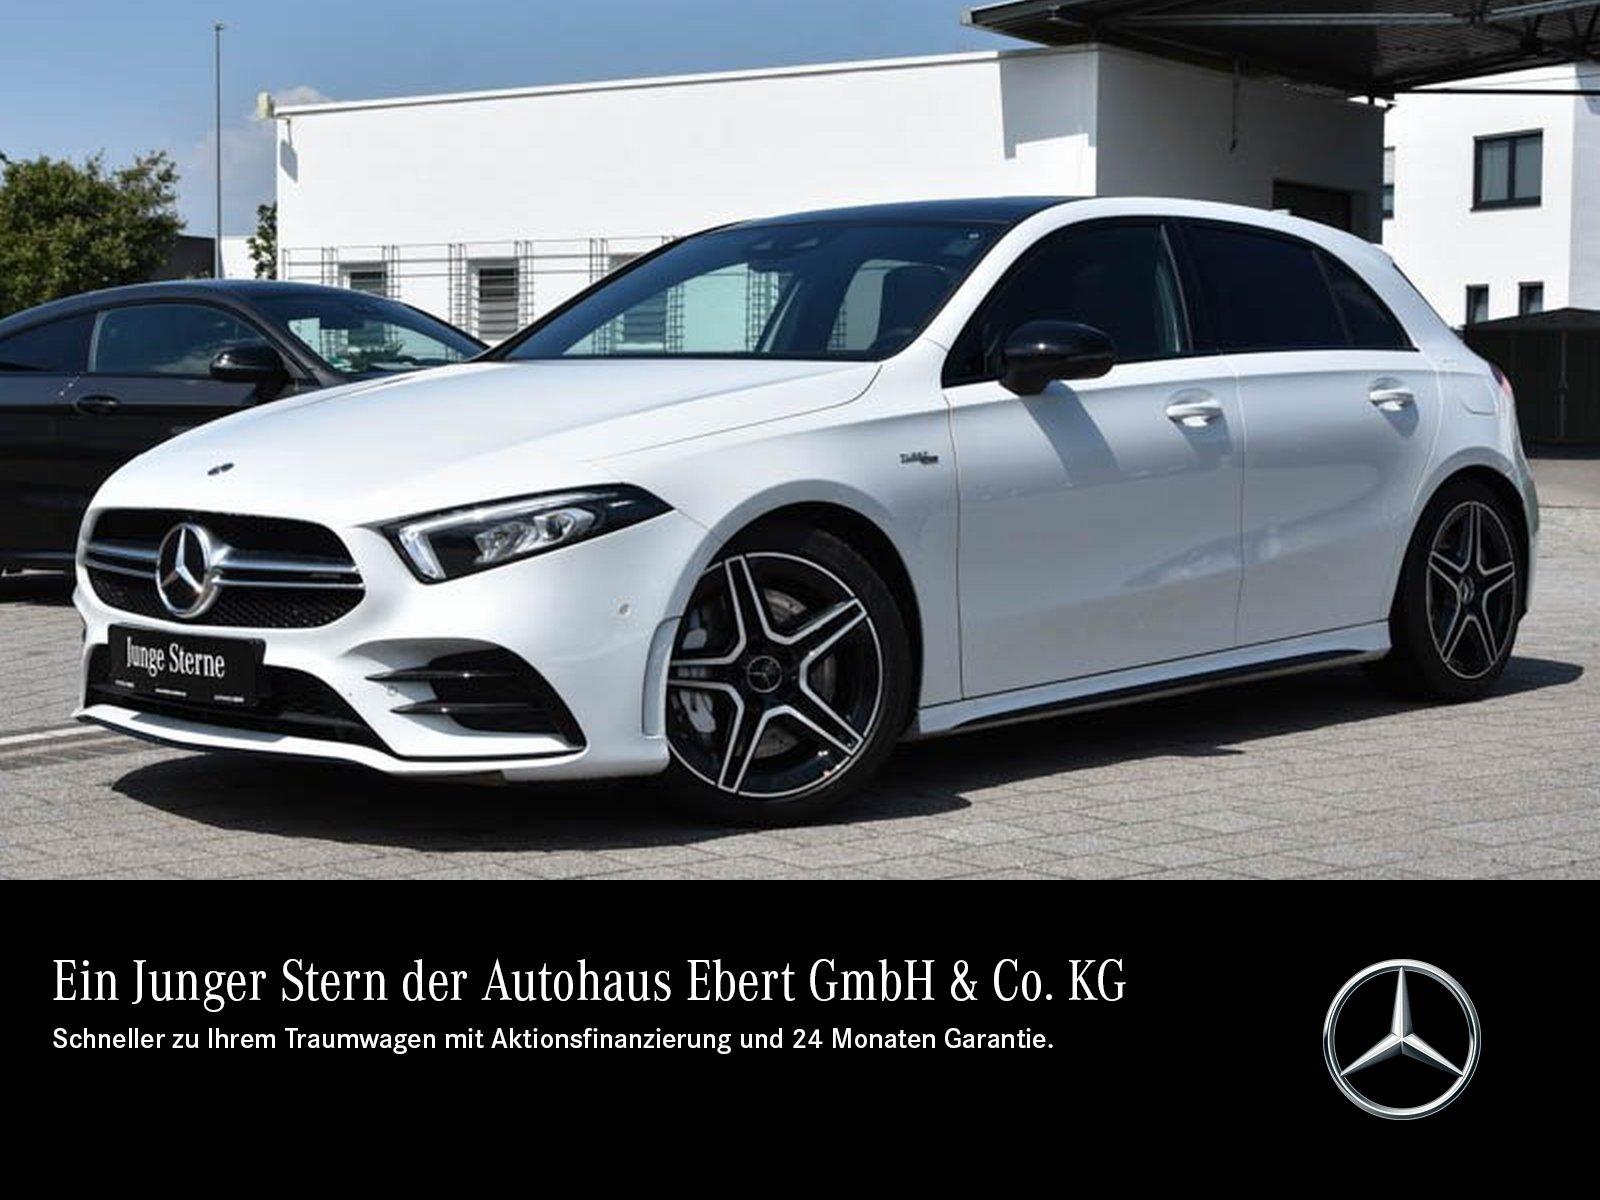 Mercedes-Benz A 35 AMG 4M NAVI PREMIUM+PSD+TOTW+RFK+LED+NIGHT, Jahr 2019, Benzin